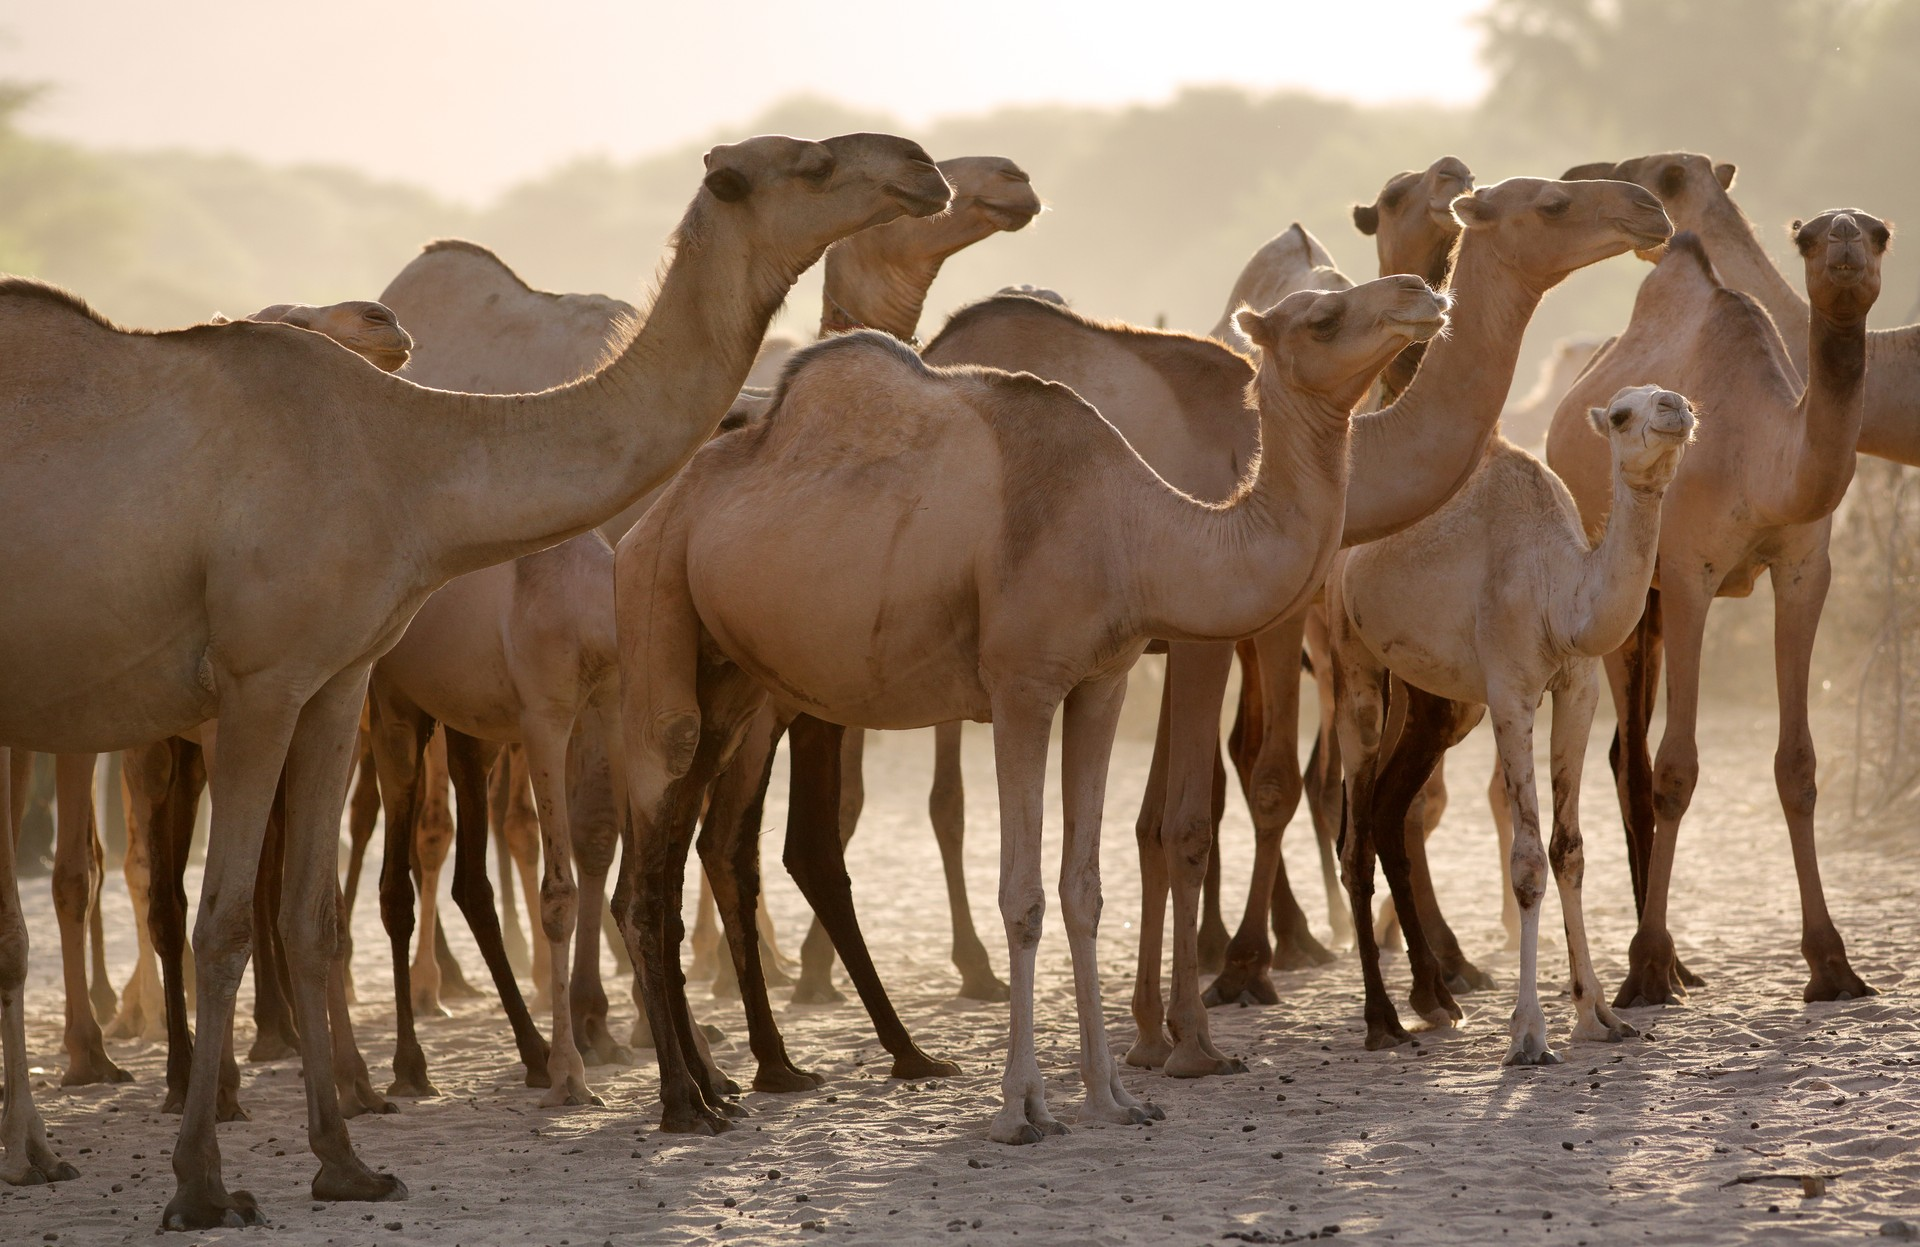 Camels in Maralal, Samburu, Kenya